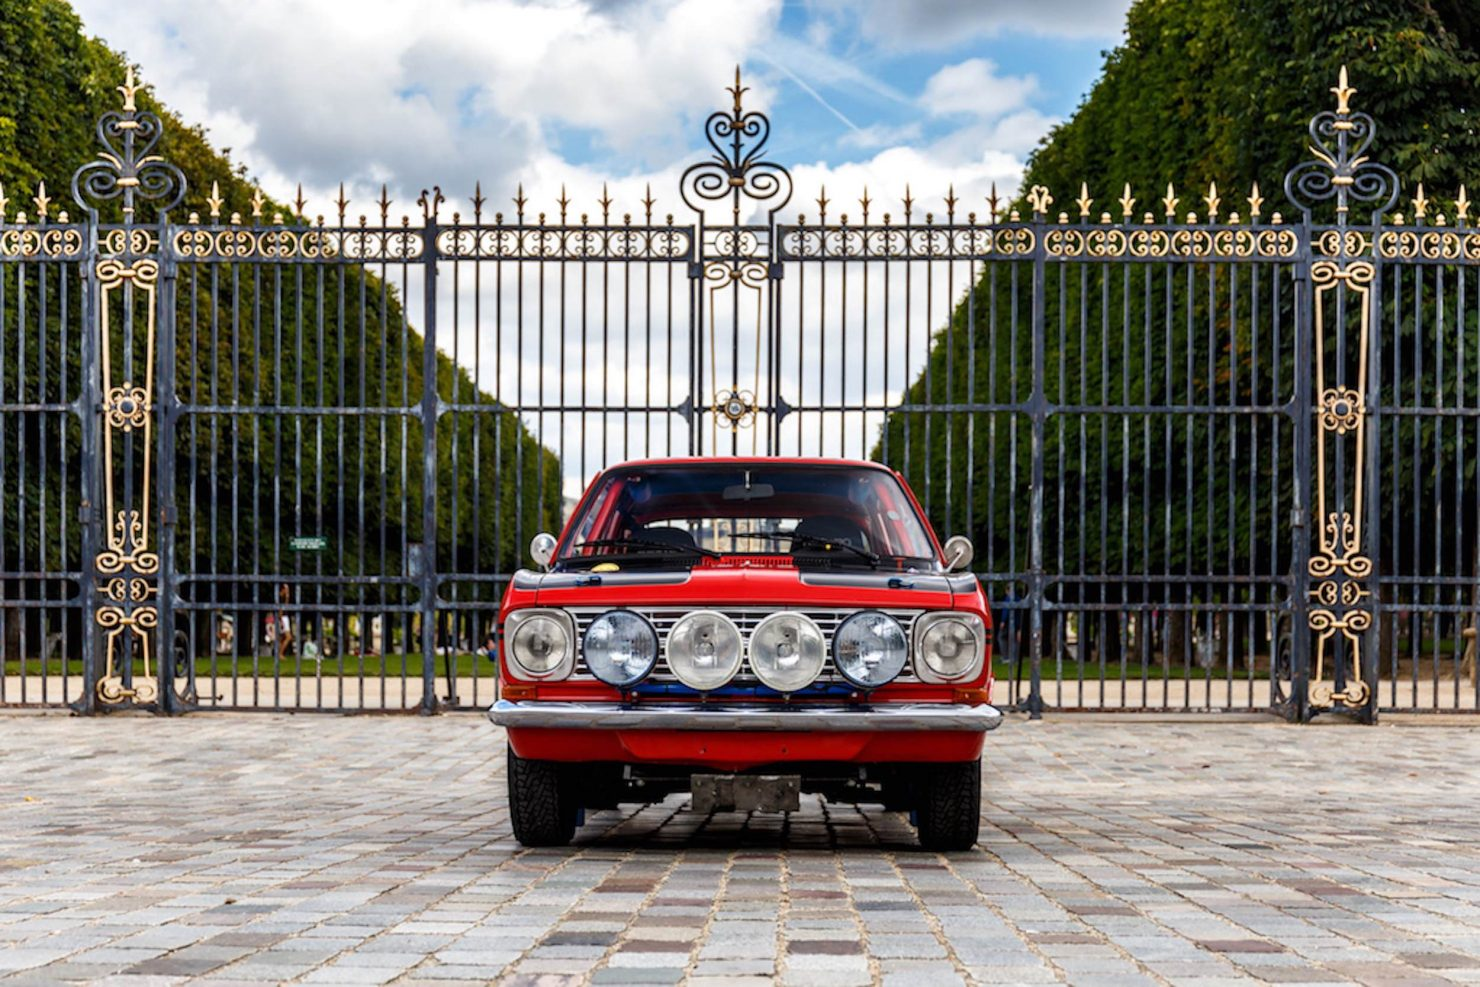 opel kadett rallye car 3 1480x987 - 1969 Opel Rallye Kadett